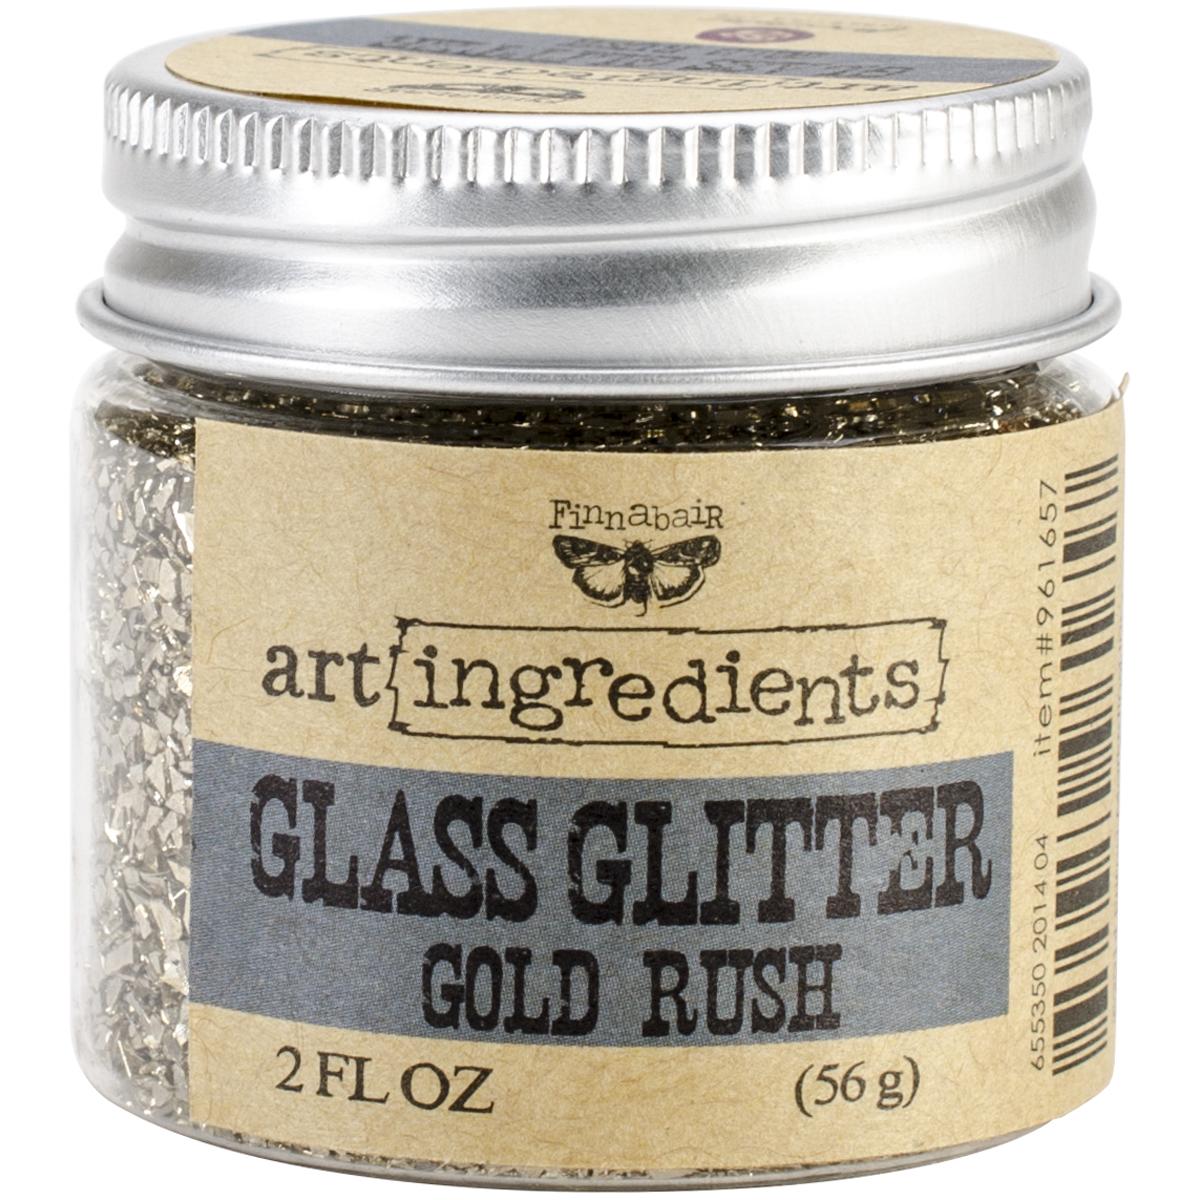 Finnabair Art Ingredients Glass Glitter 2oz-Gold Rush